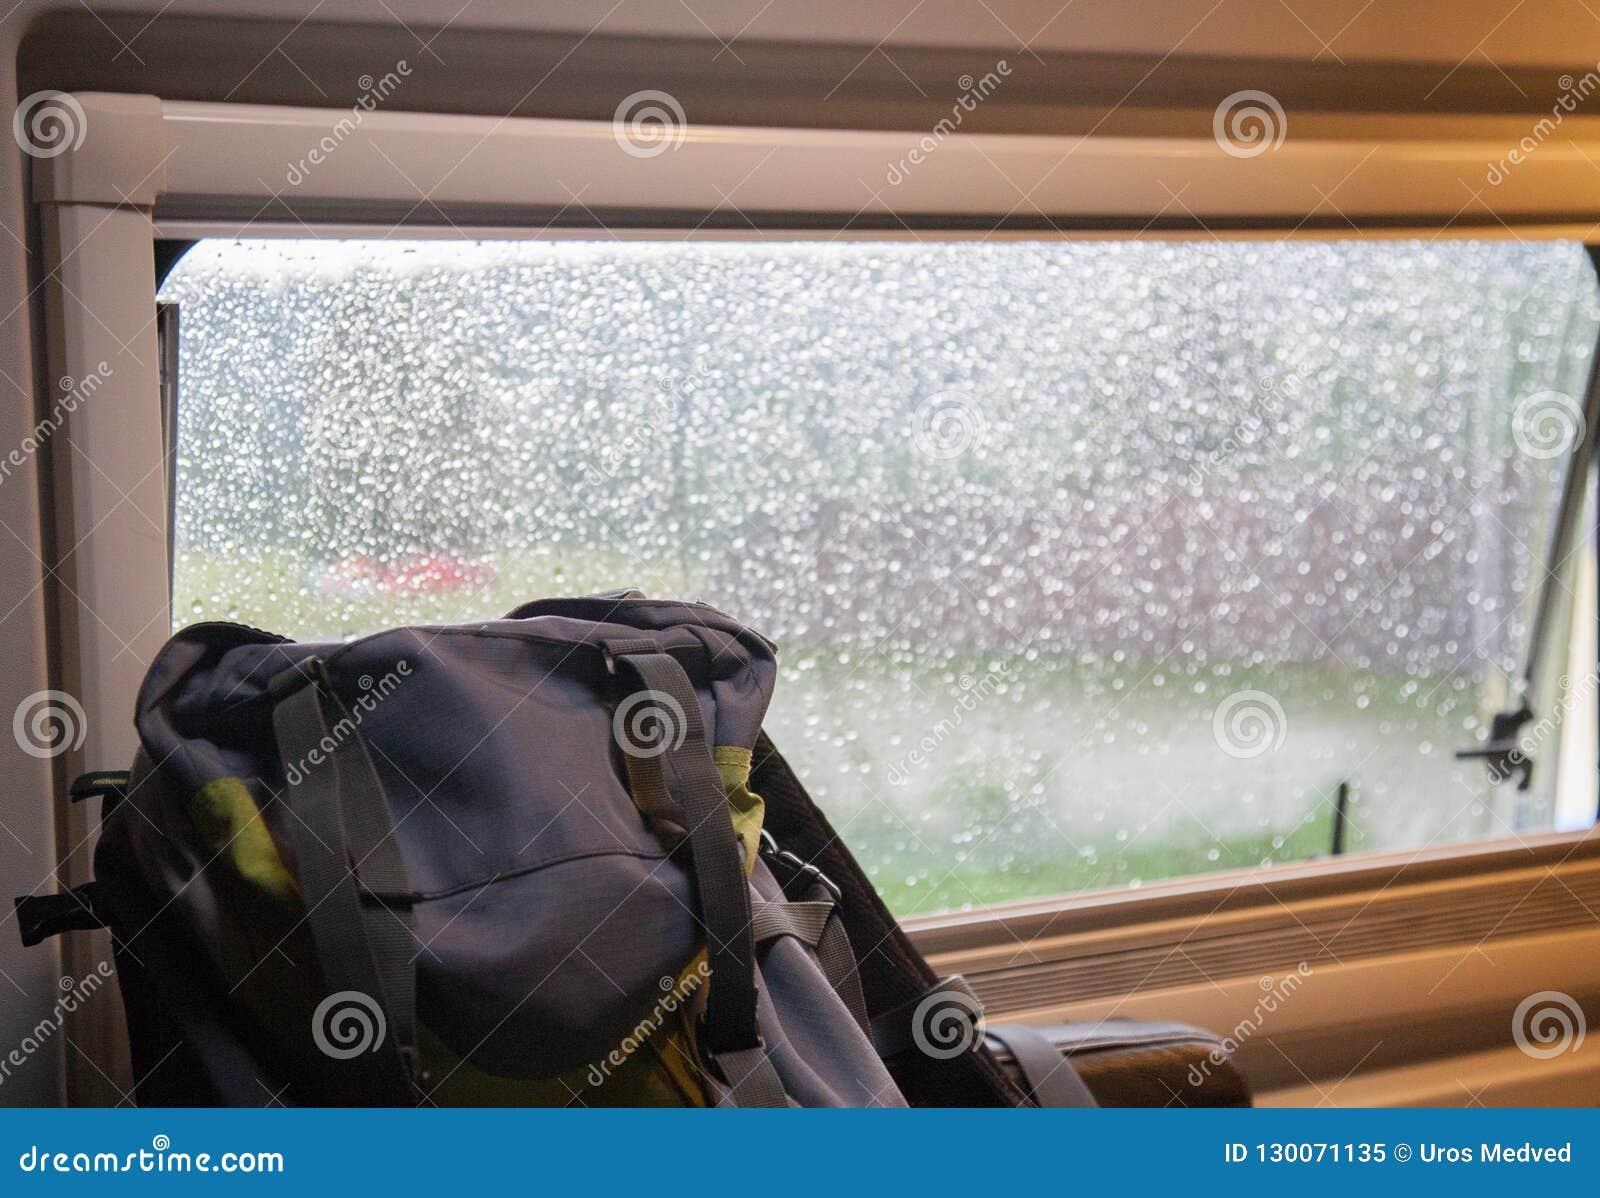 Backpack stock image  Image of nature, window, rain - 130071135